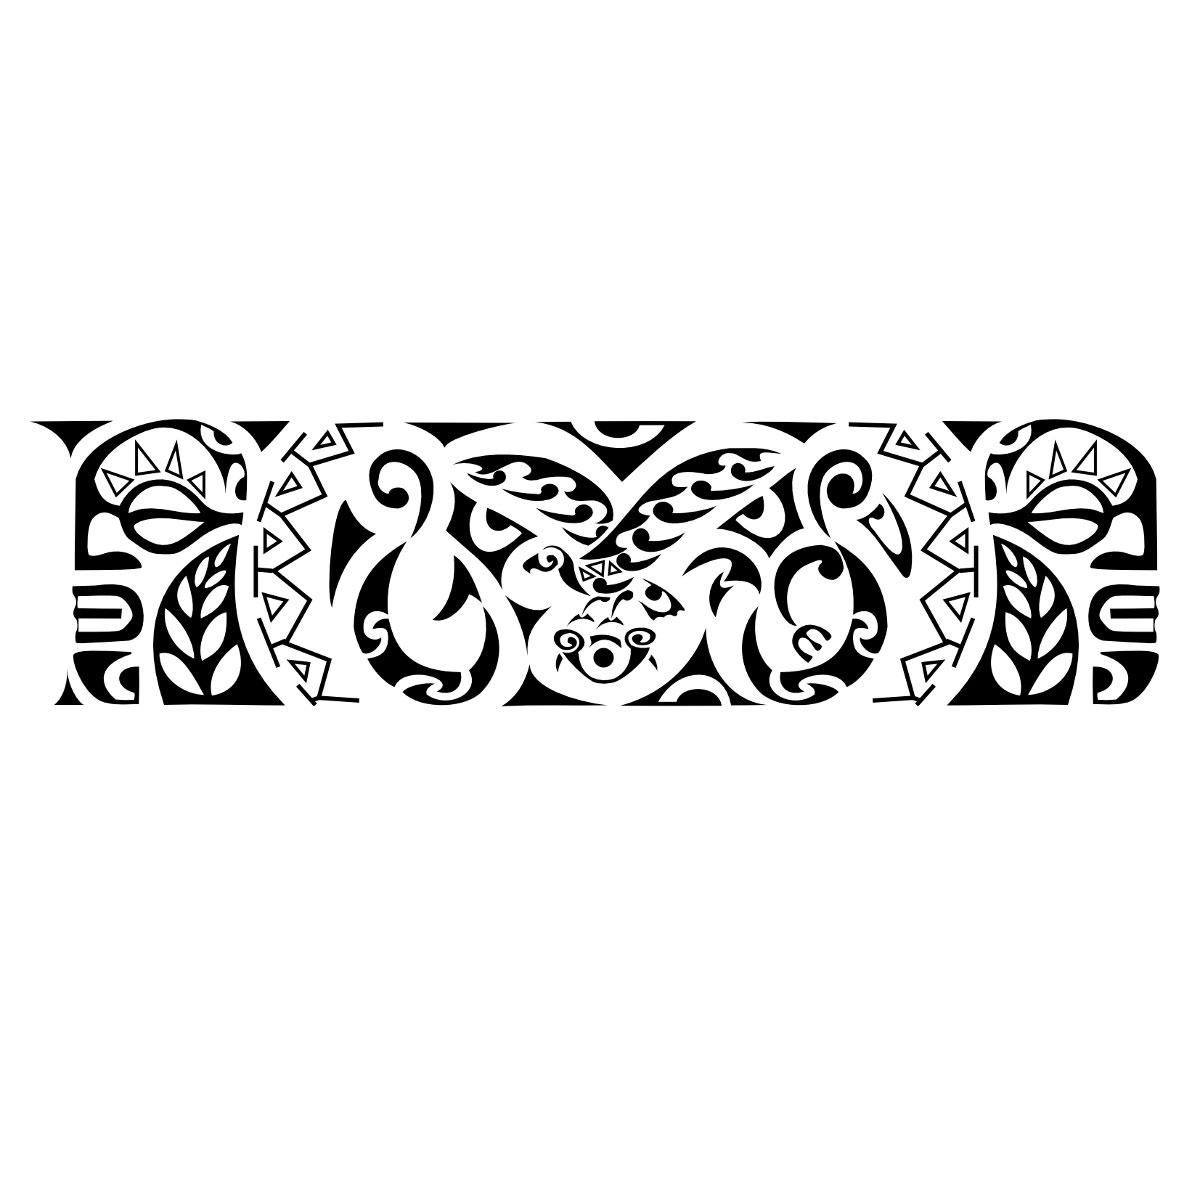 bluskytattoo maori significato 121. Black Bedroom Furniture Sets. Home Design Ideas